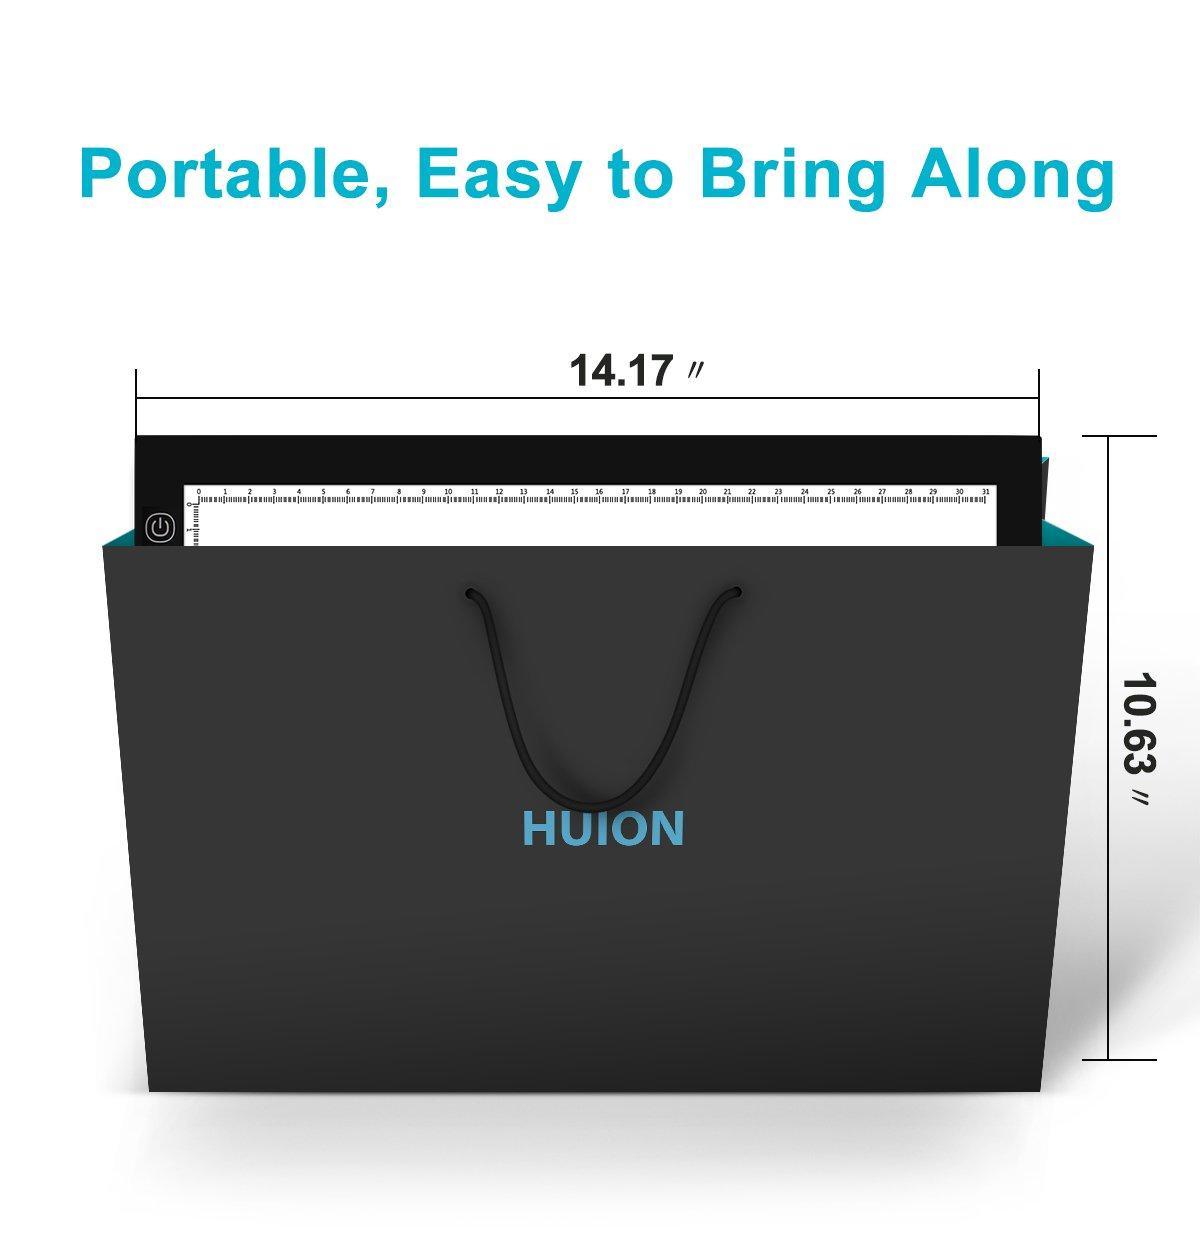 Huion A4 LED Light Pad Tracing Light Box Adjustable Brightness AC Powered 12.2x8.27 Inch